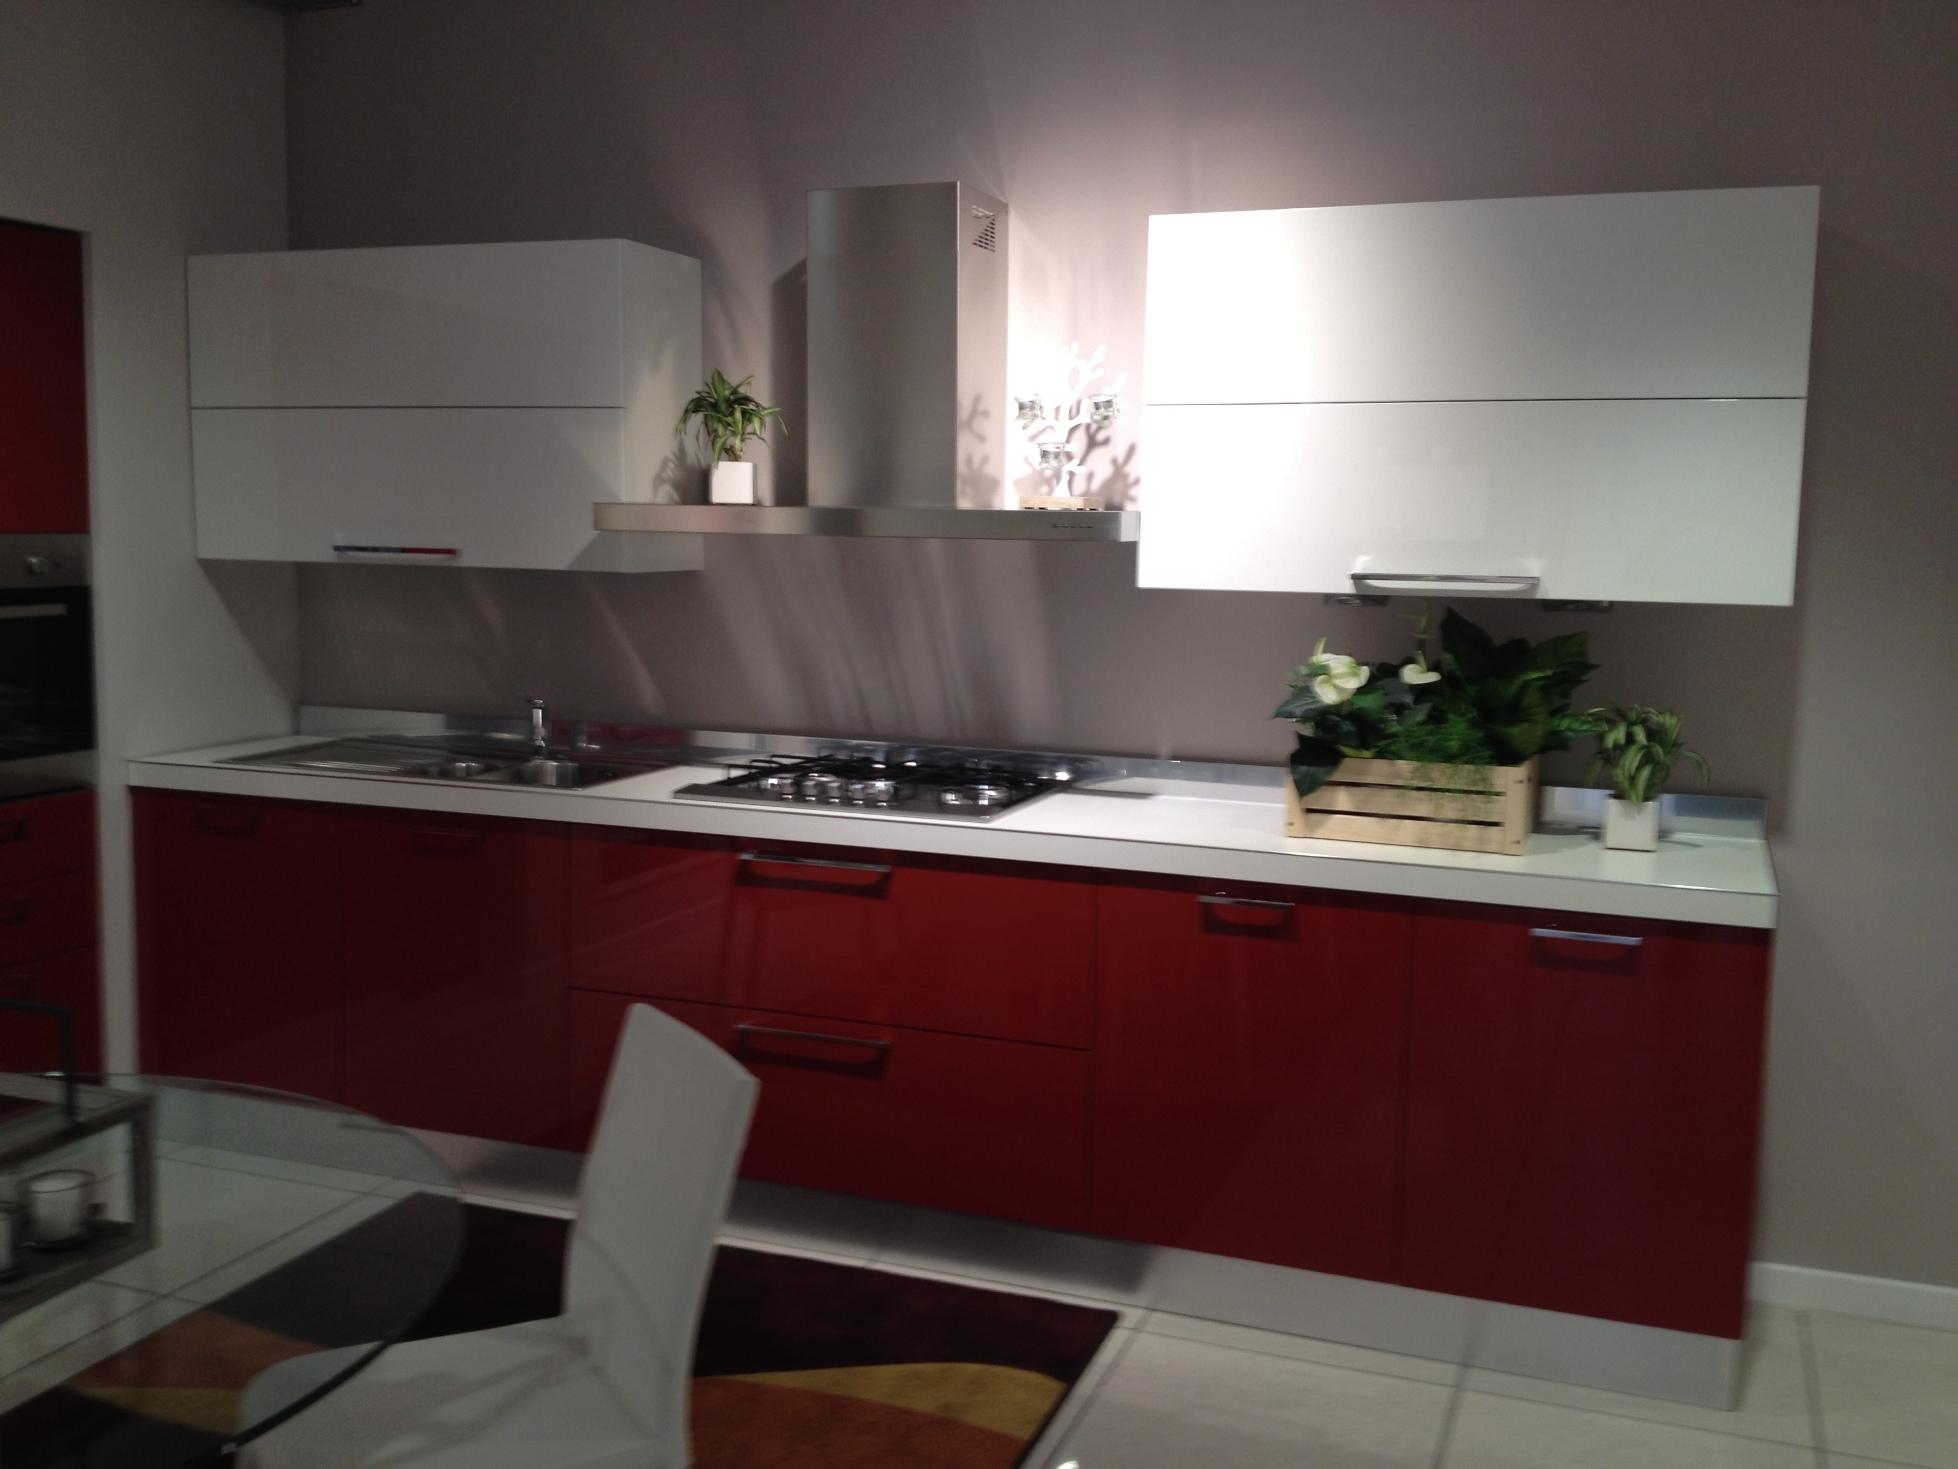 Scavolini cucina sax moderna laccato lucido rossa cucine a prezzi scontati - Cucina rossa e bianca ...